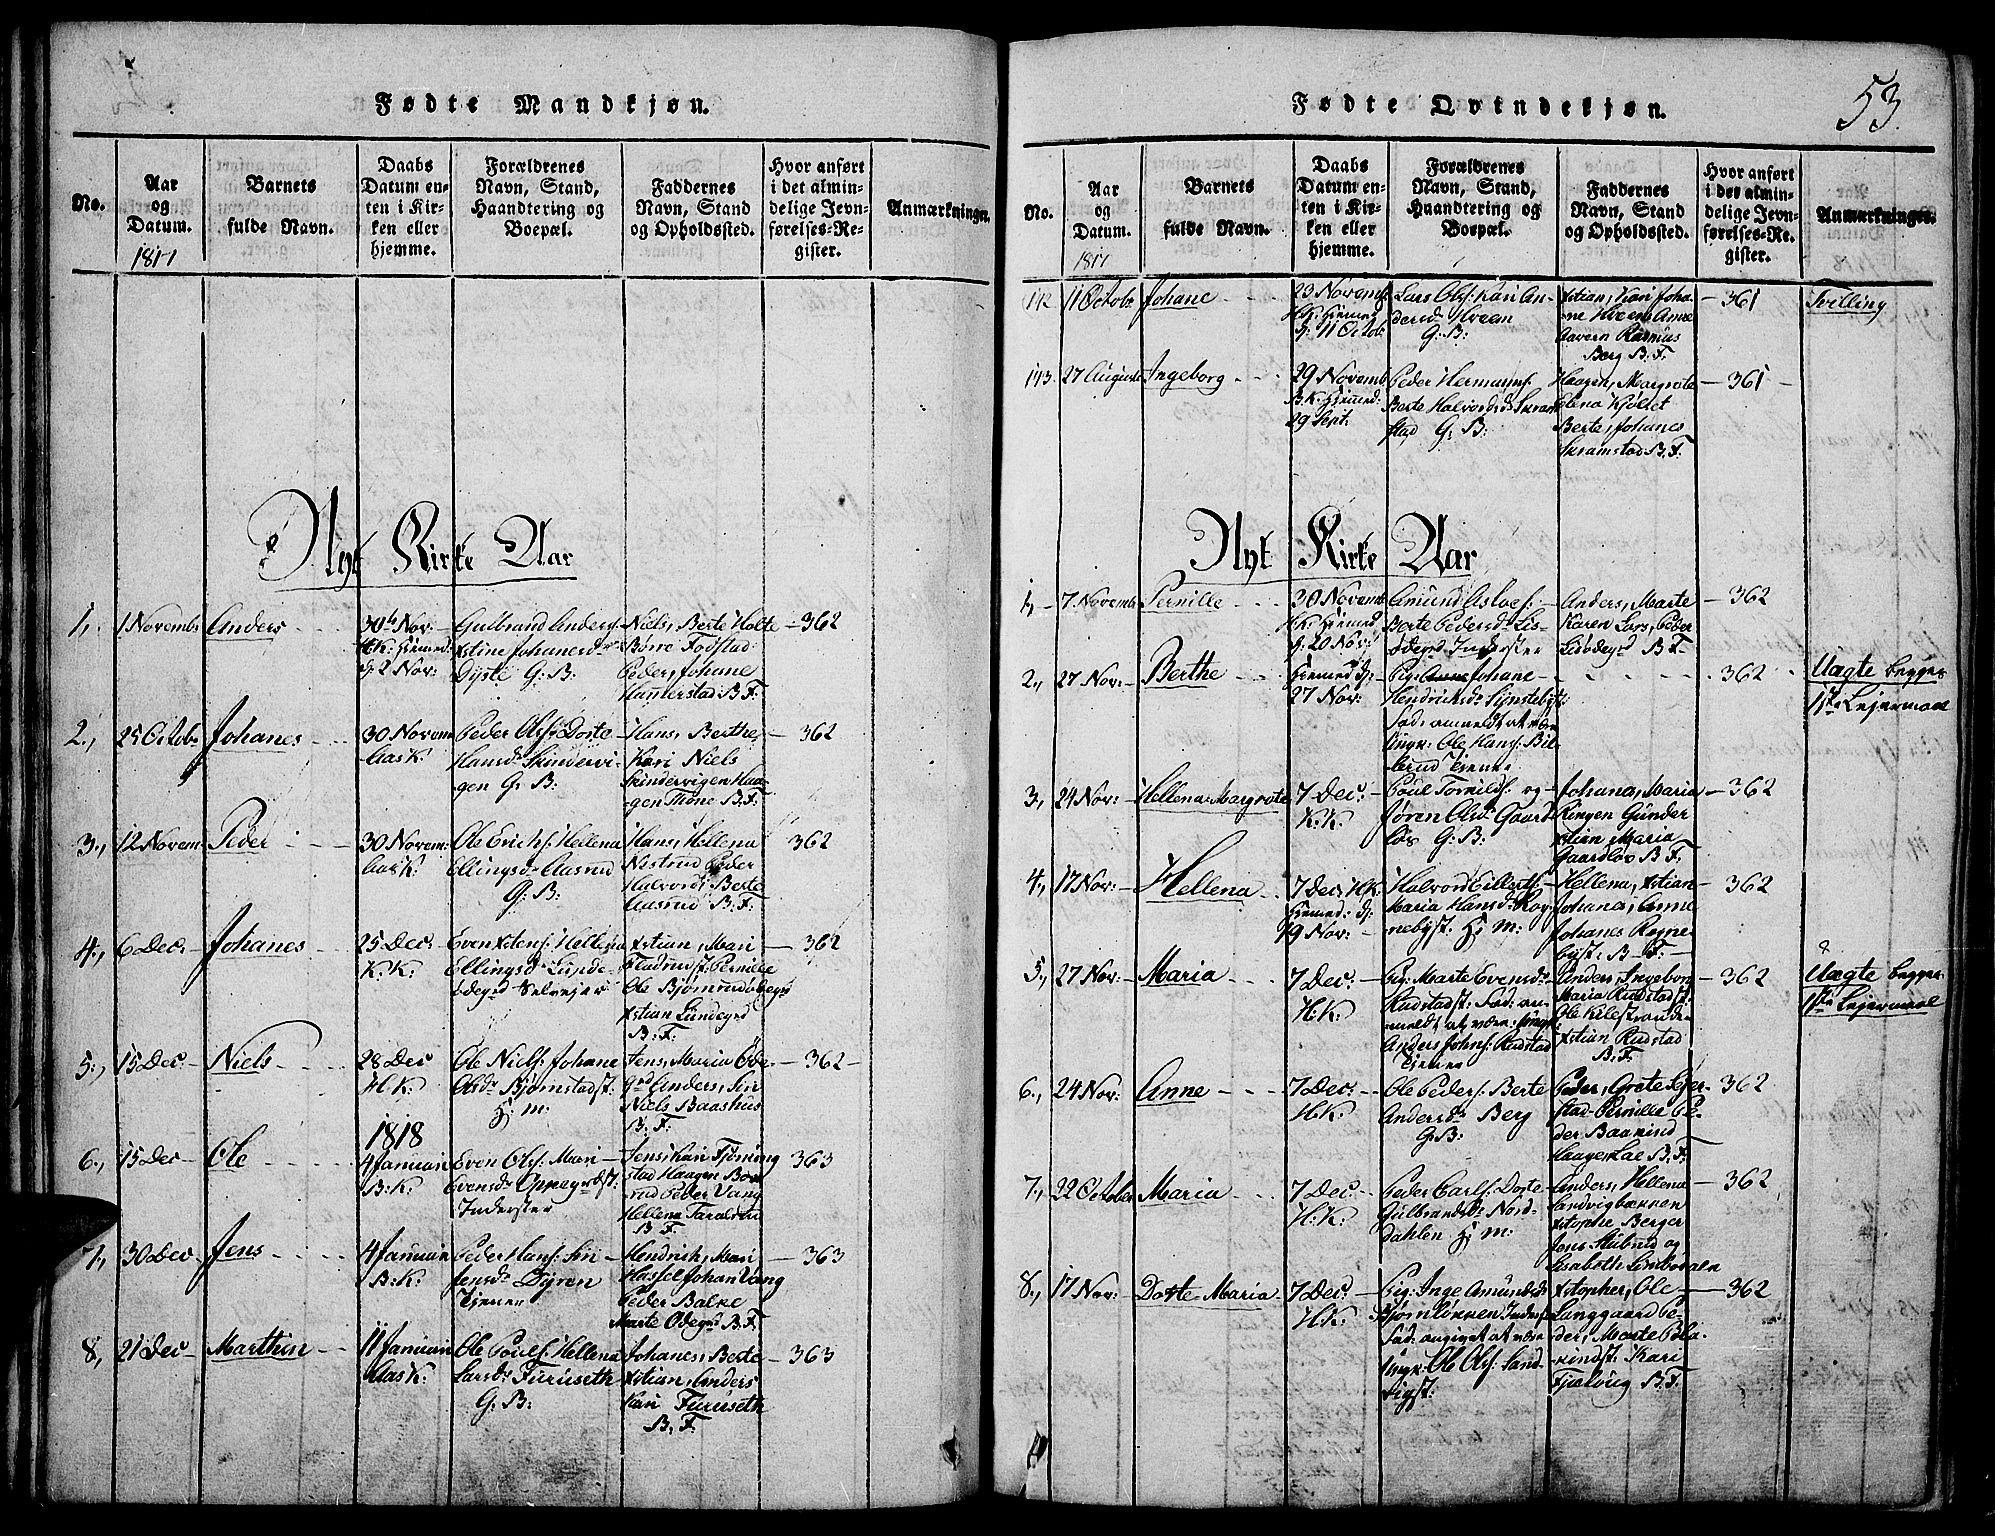 SAH, Toten prestekontor, Ministerialbok nr. 9, 1814-1820, s. 53